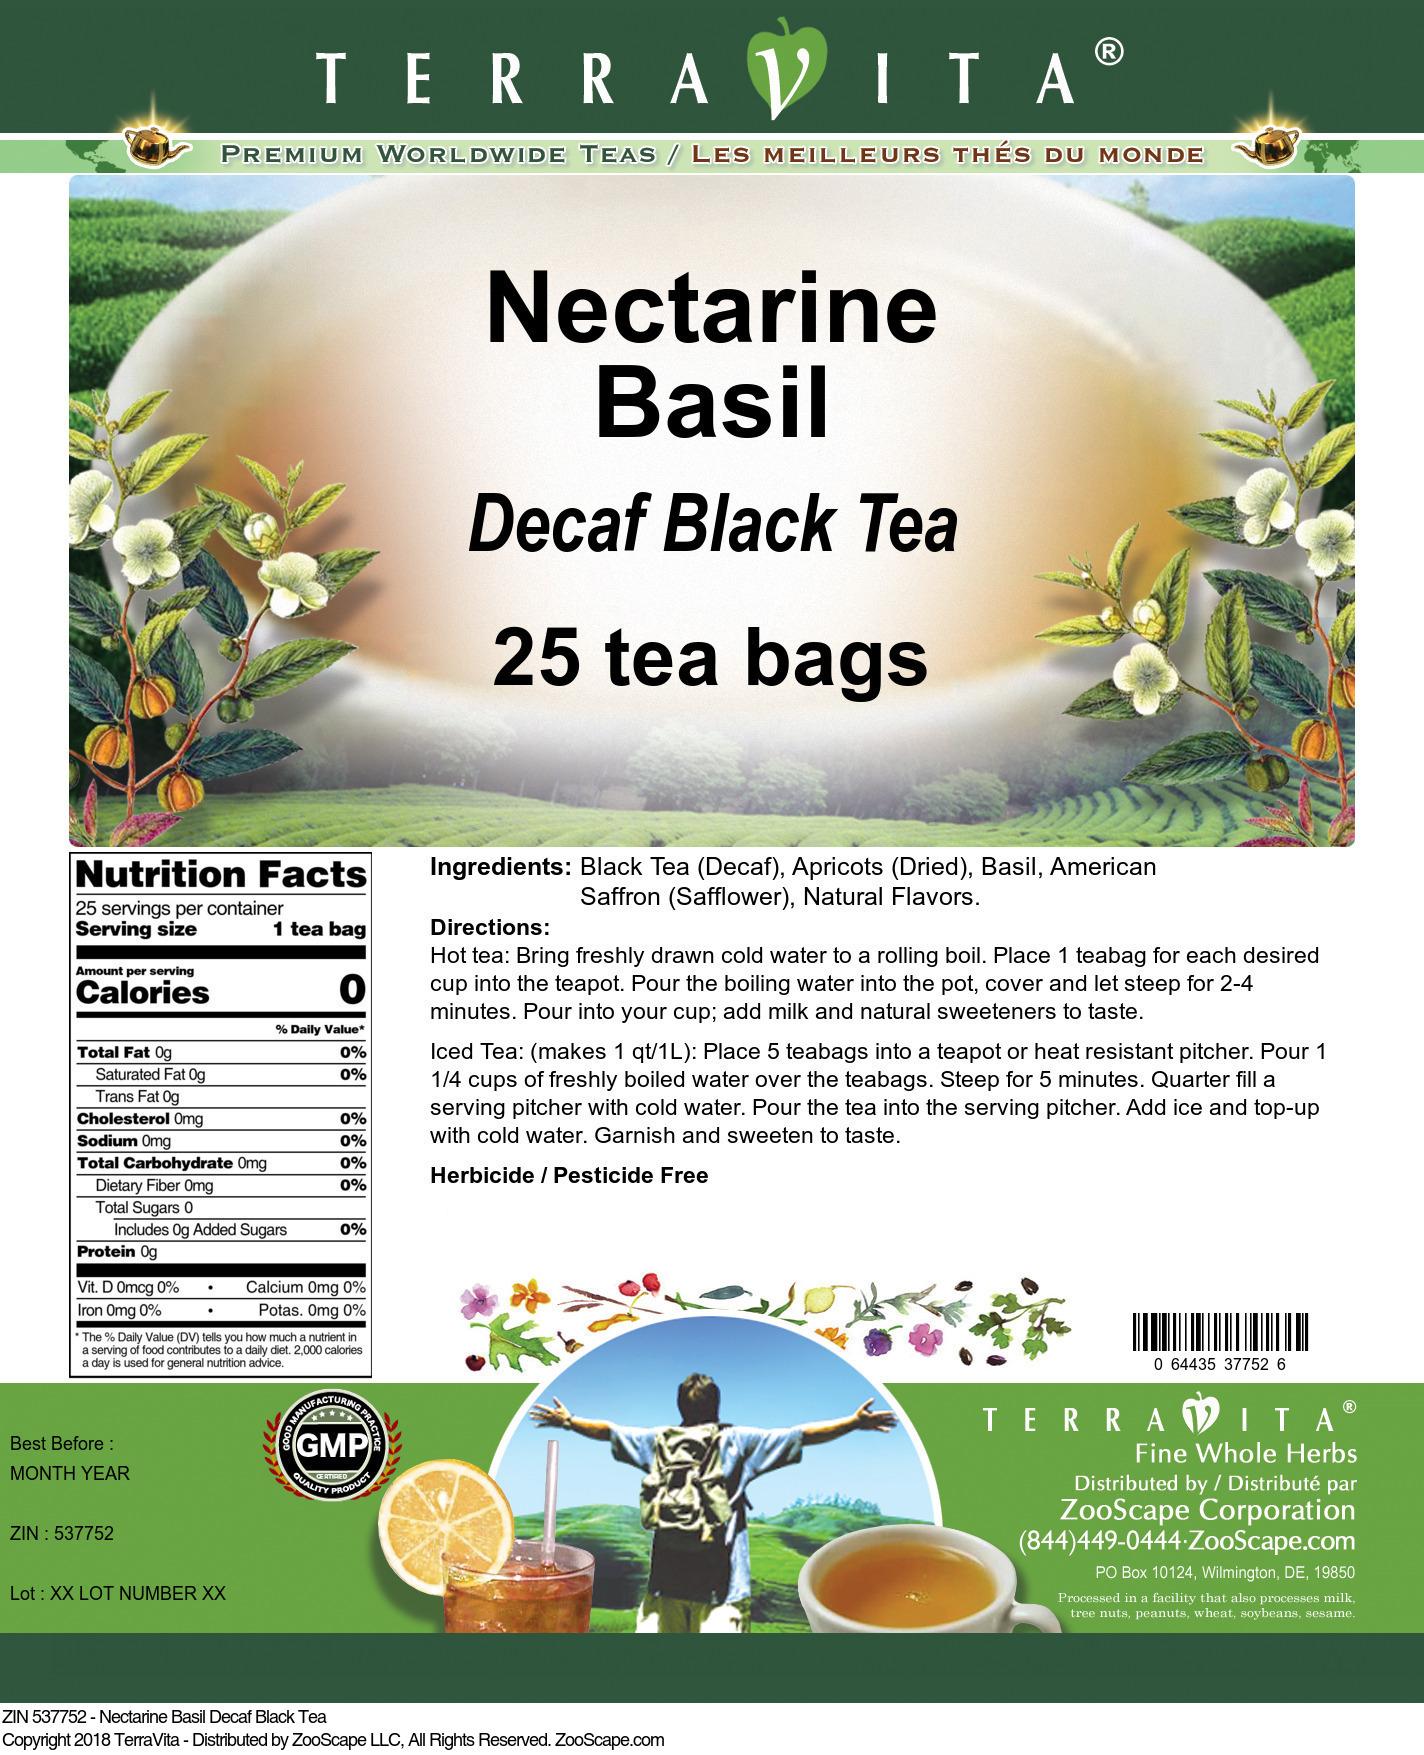 Nectarine Basil Decaf Black Tea